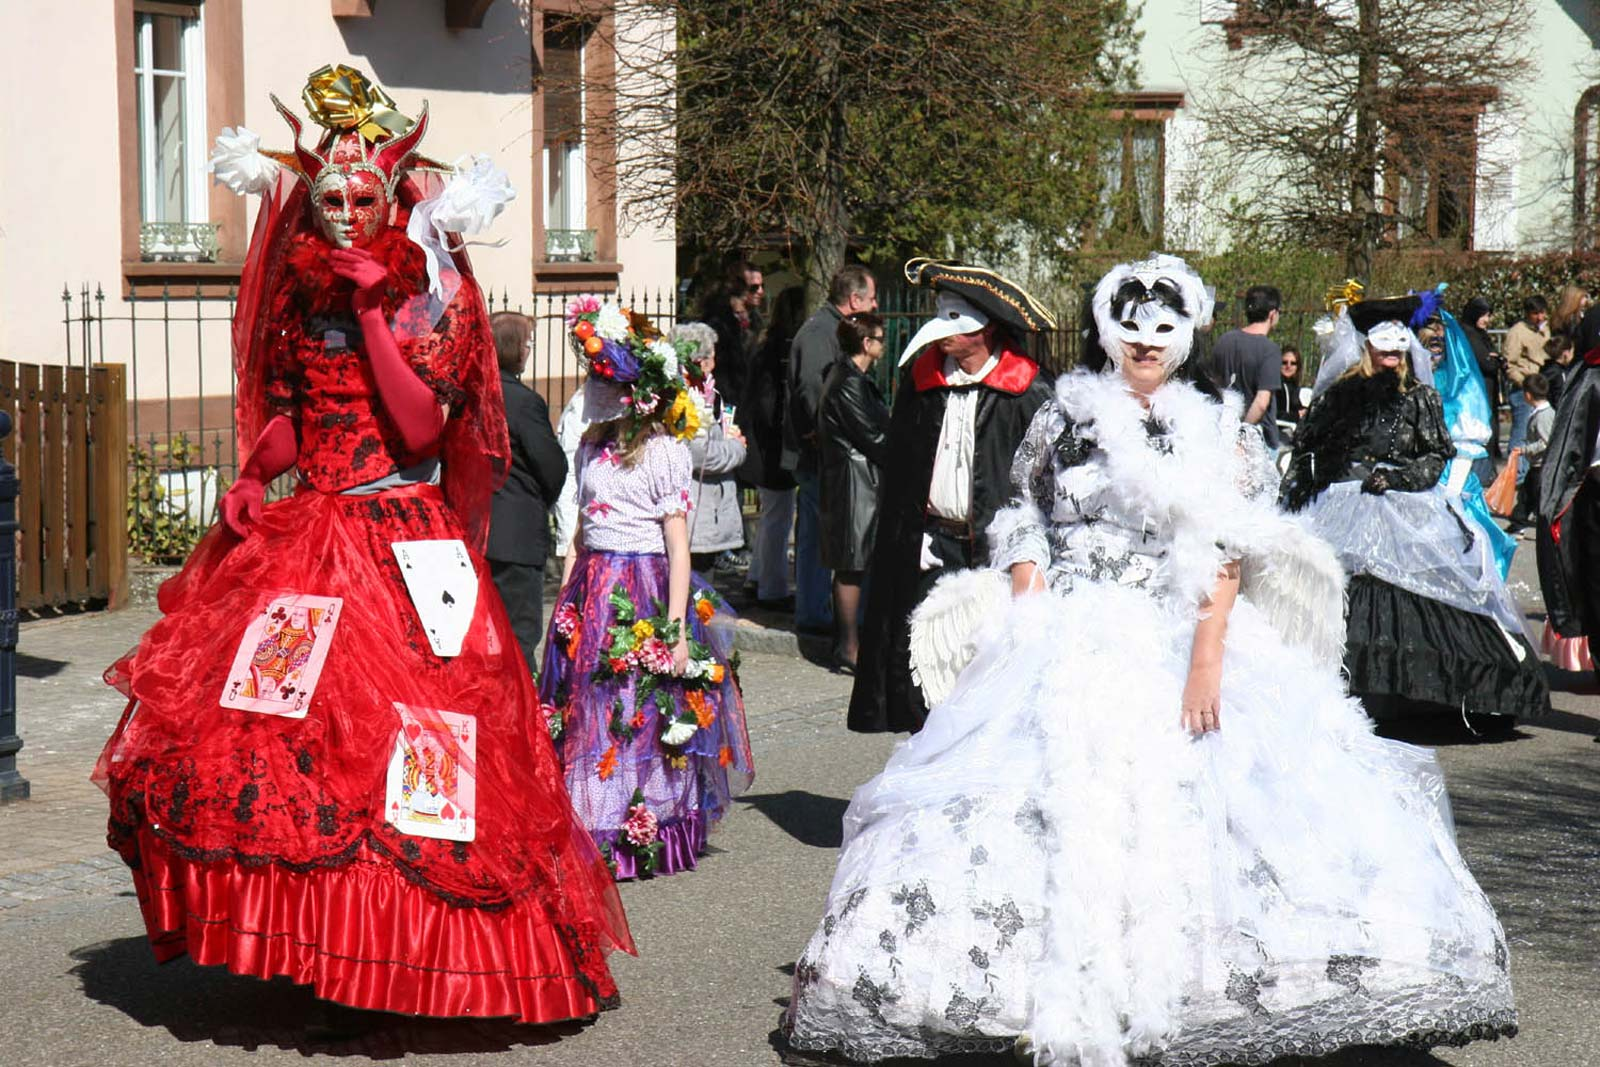 https://apps.tourisme-alsace.info/photos/niederbronn/photos/Carnaval.jpg